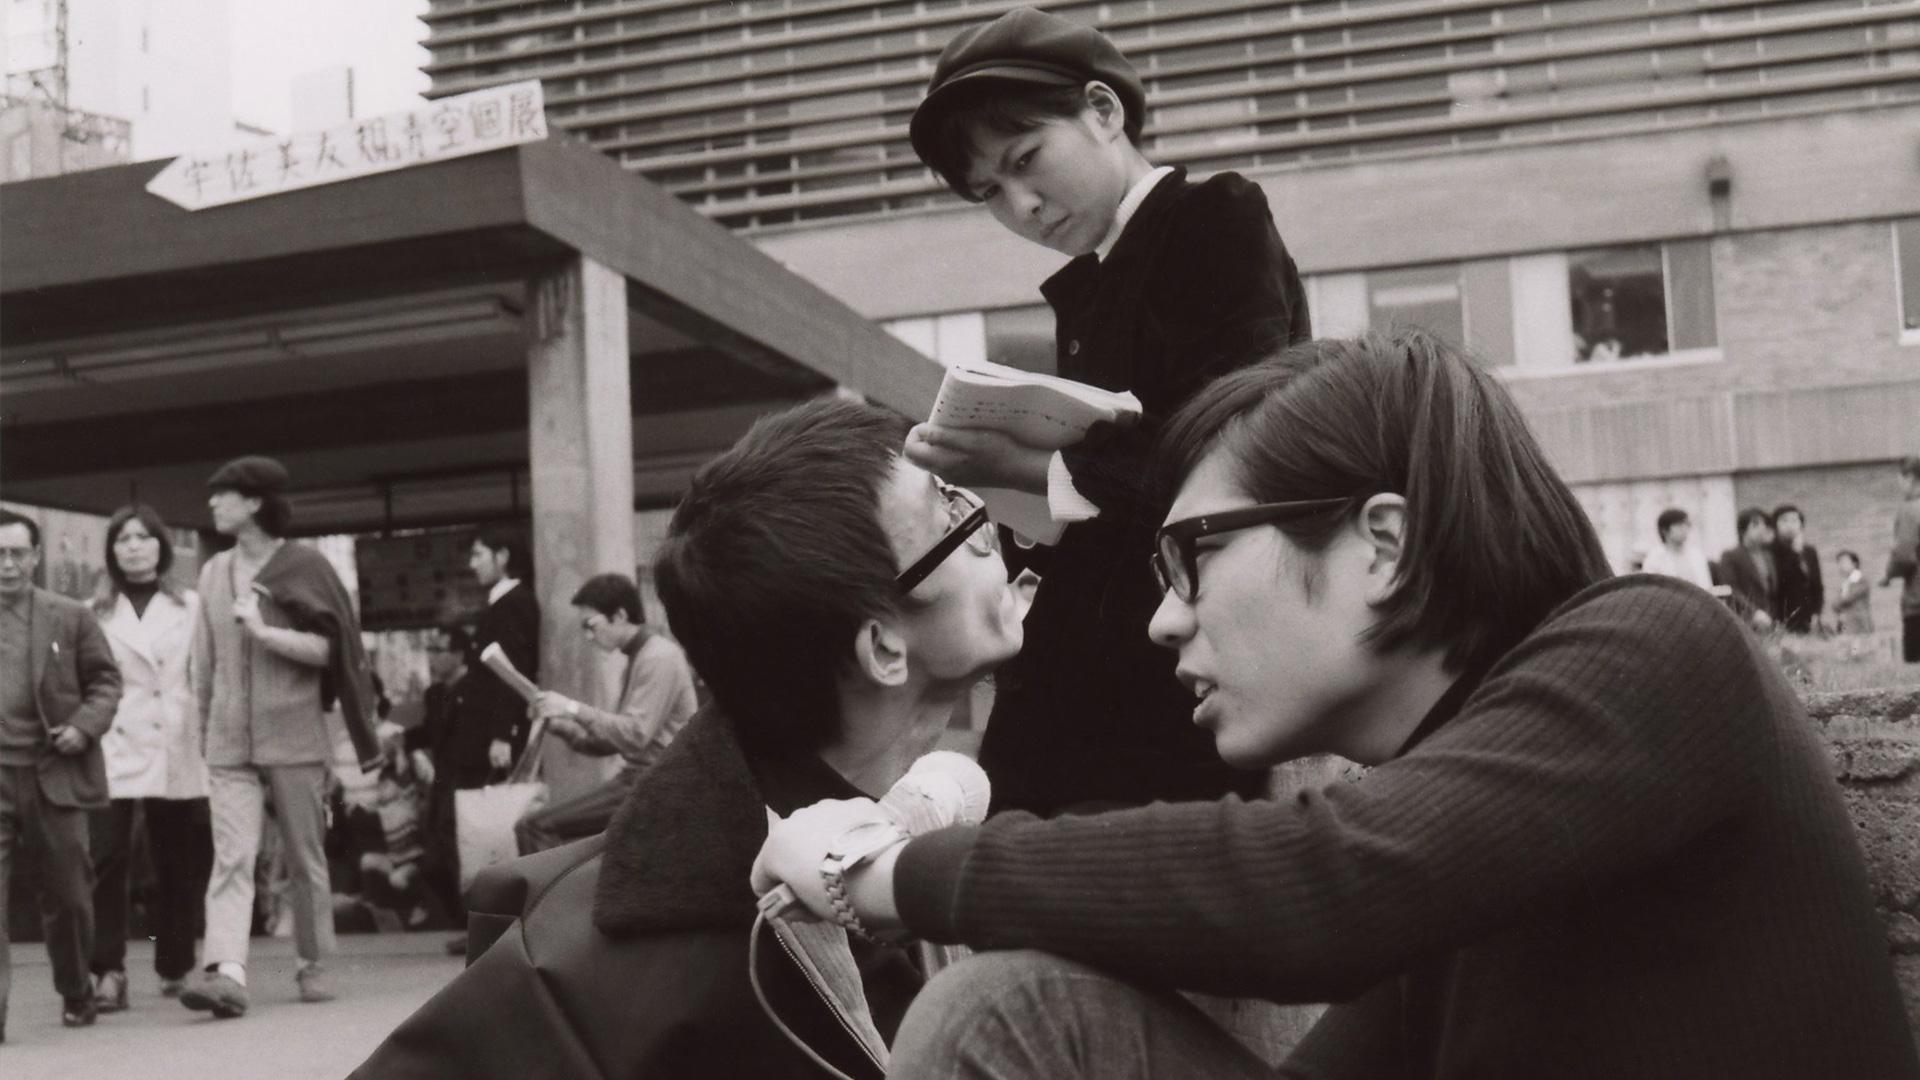 Cinema as Struggle: The Films of Kazuo Hara & Sachiko Kobayashi